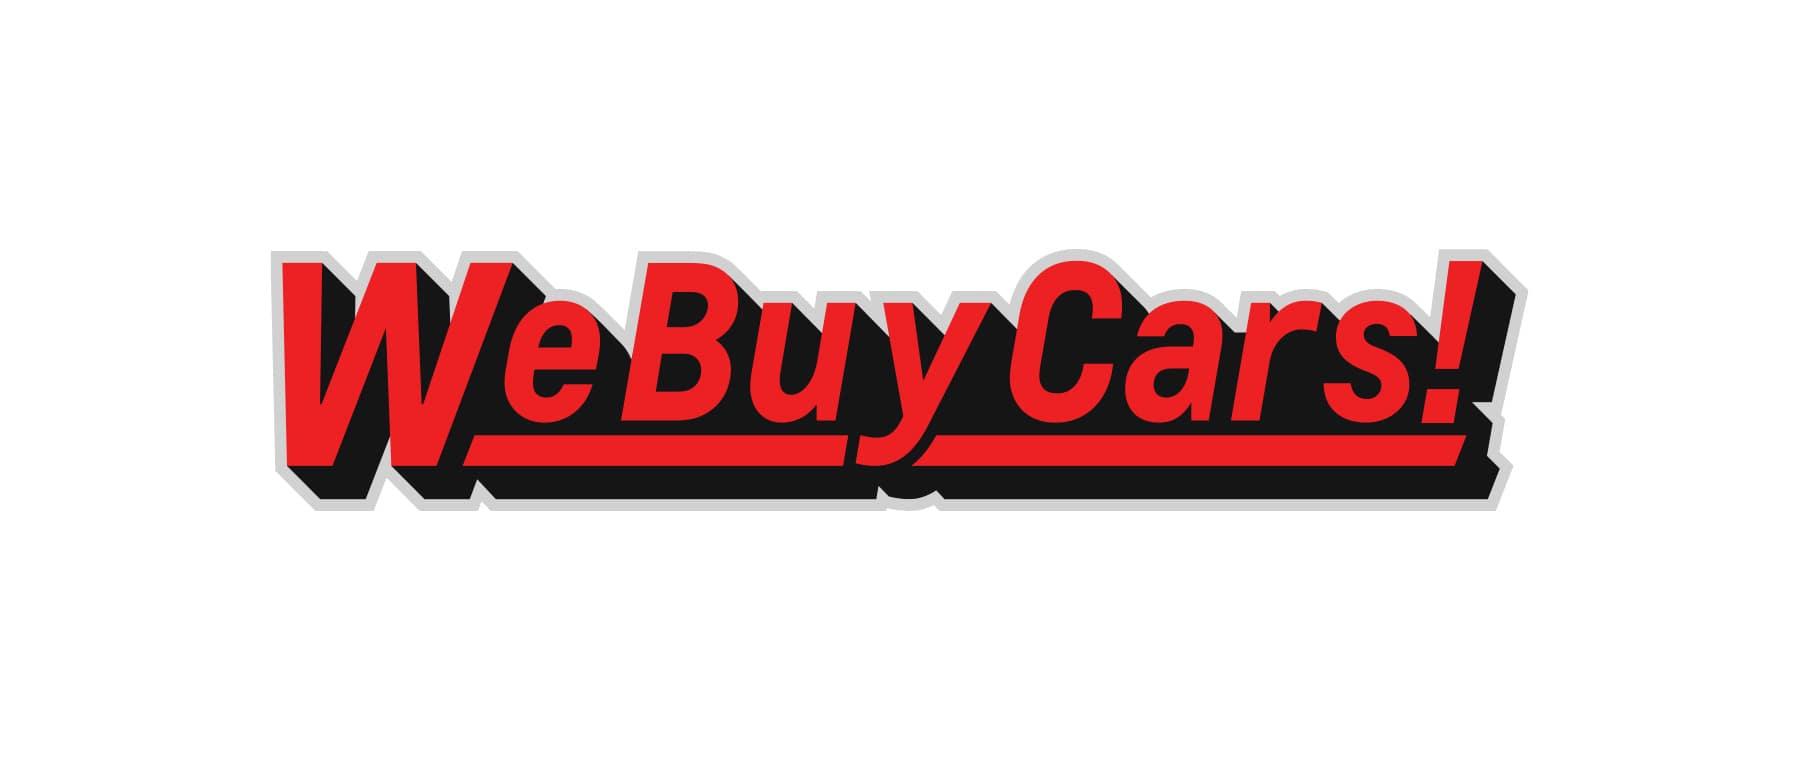 Mazda_1800x760_WeBuyCars